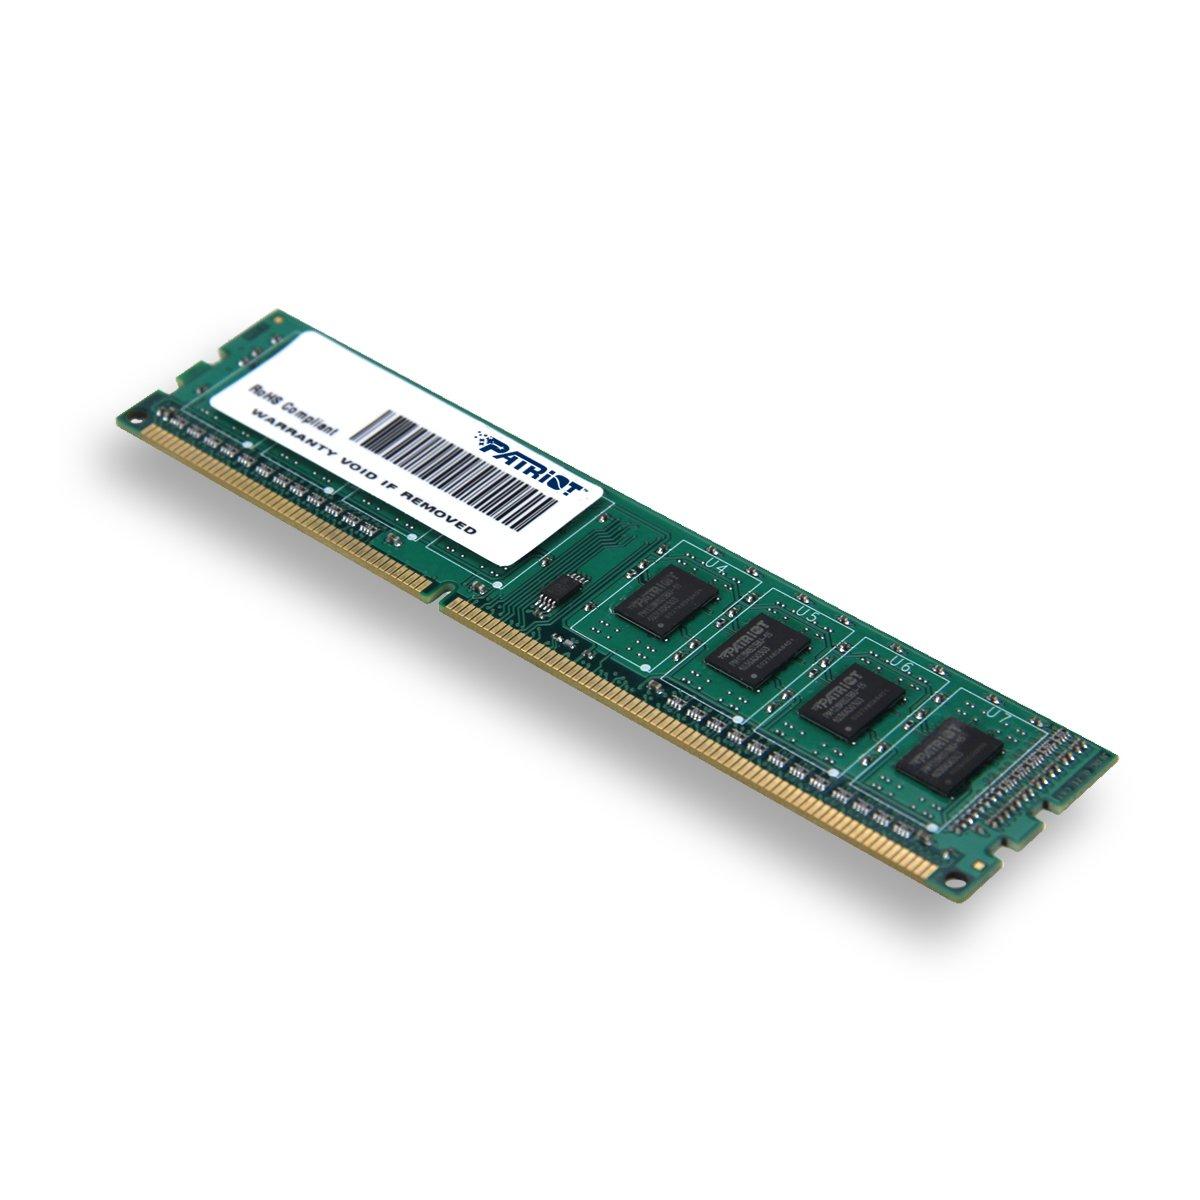 Patriot Signature 4 GB PC3-10600 (1333 MHz) DDR3 Desktop Memory PSD34G13332 by Patriot (Image #1)